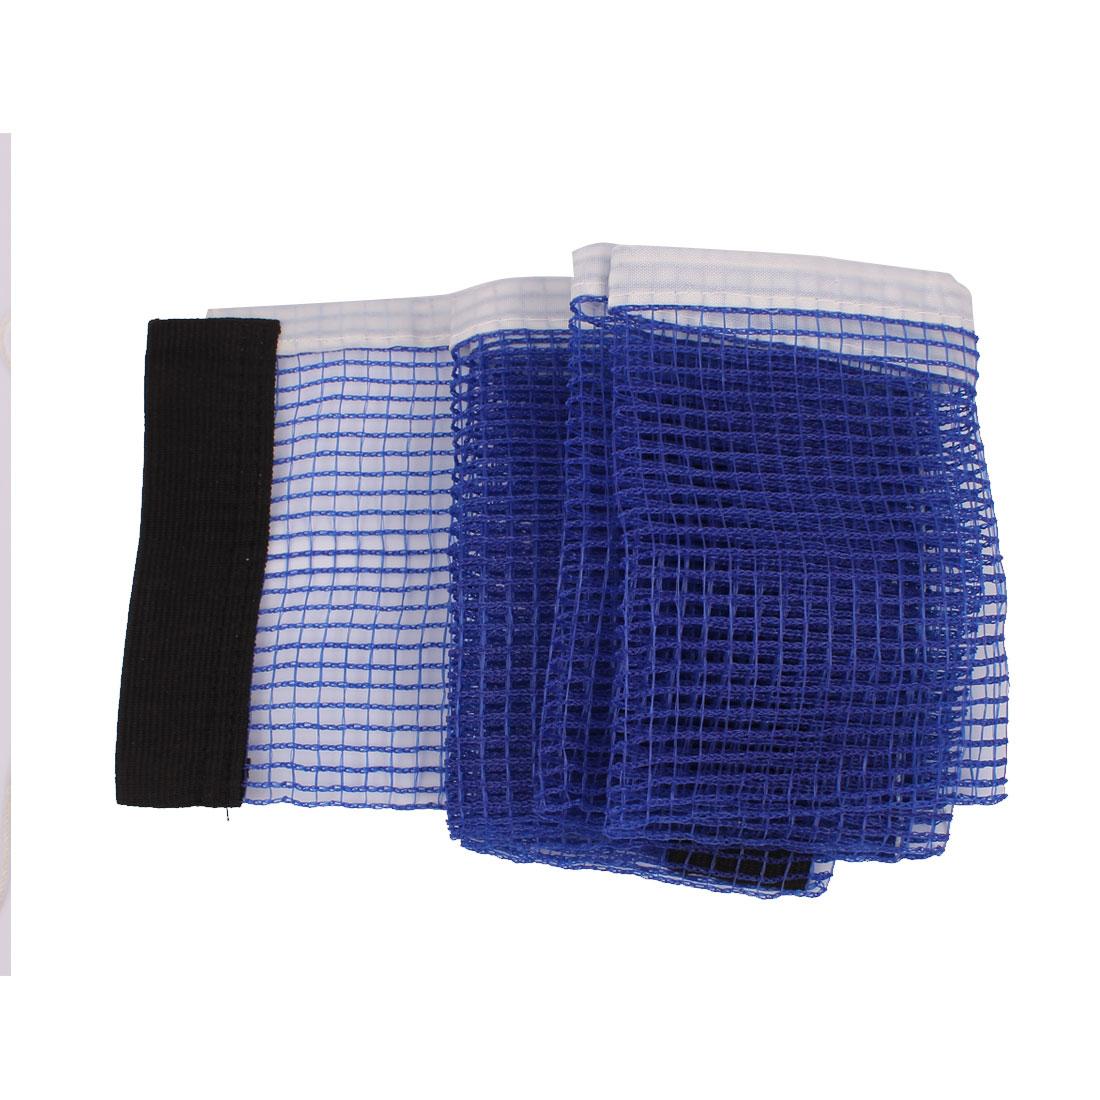 Nylon Indoor Games Pingpong Sports Table Tennis Meshy Net Blue 172 x 14cm